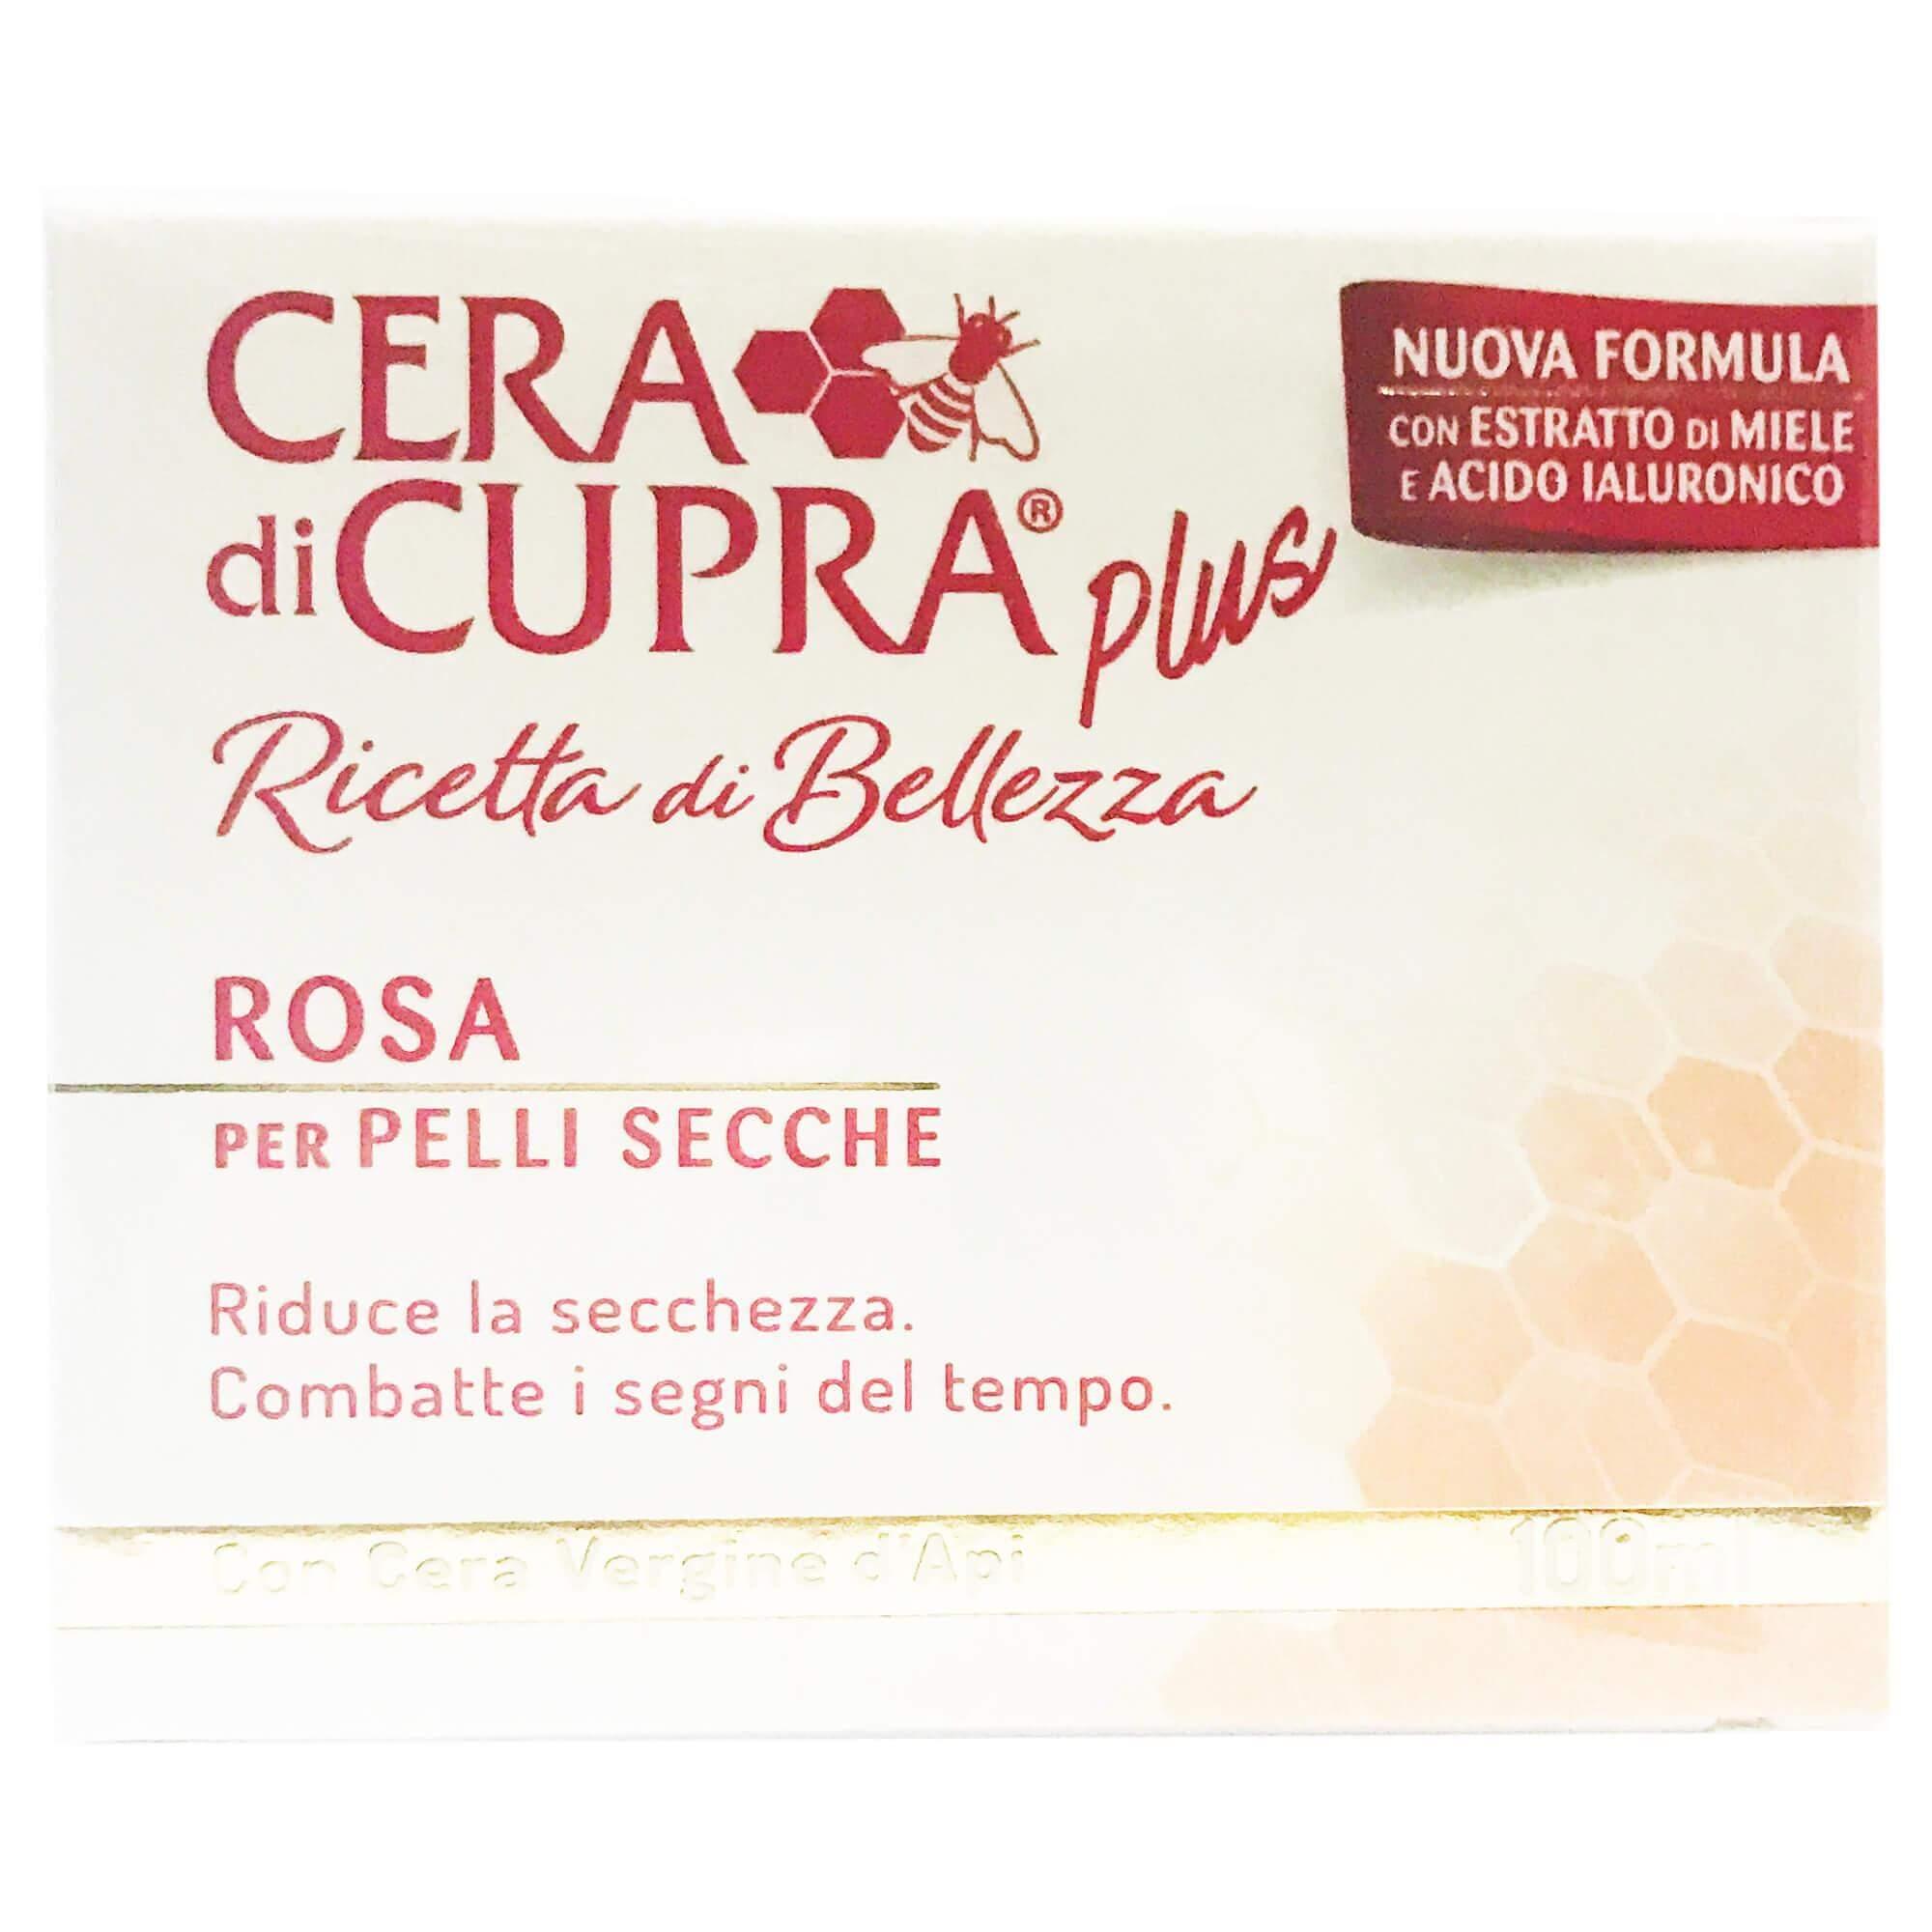 Cera di Cupra Plus Ricetta di Bellezza Rosa Αντιγηραντική, Θρεπτική &Προστατευτική Κρέμαγια Ξηρό Δέρμα100ml